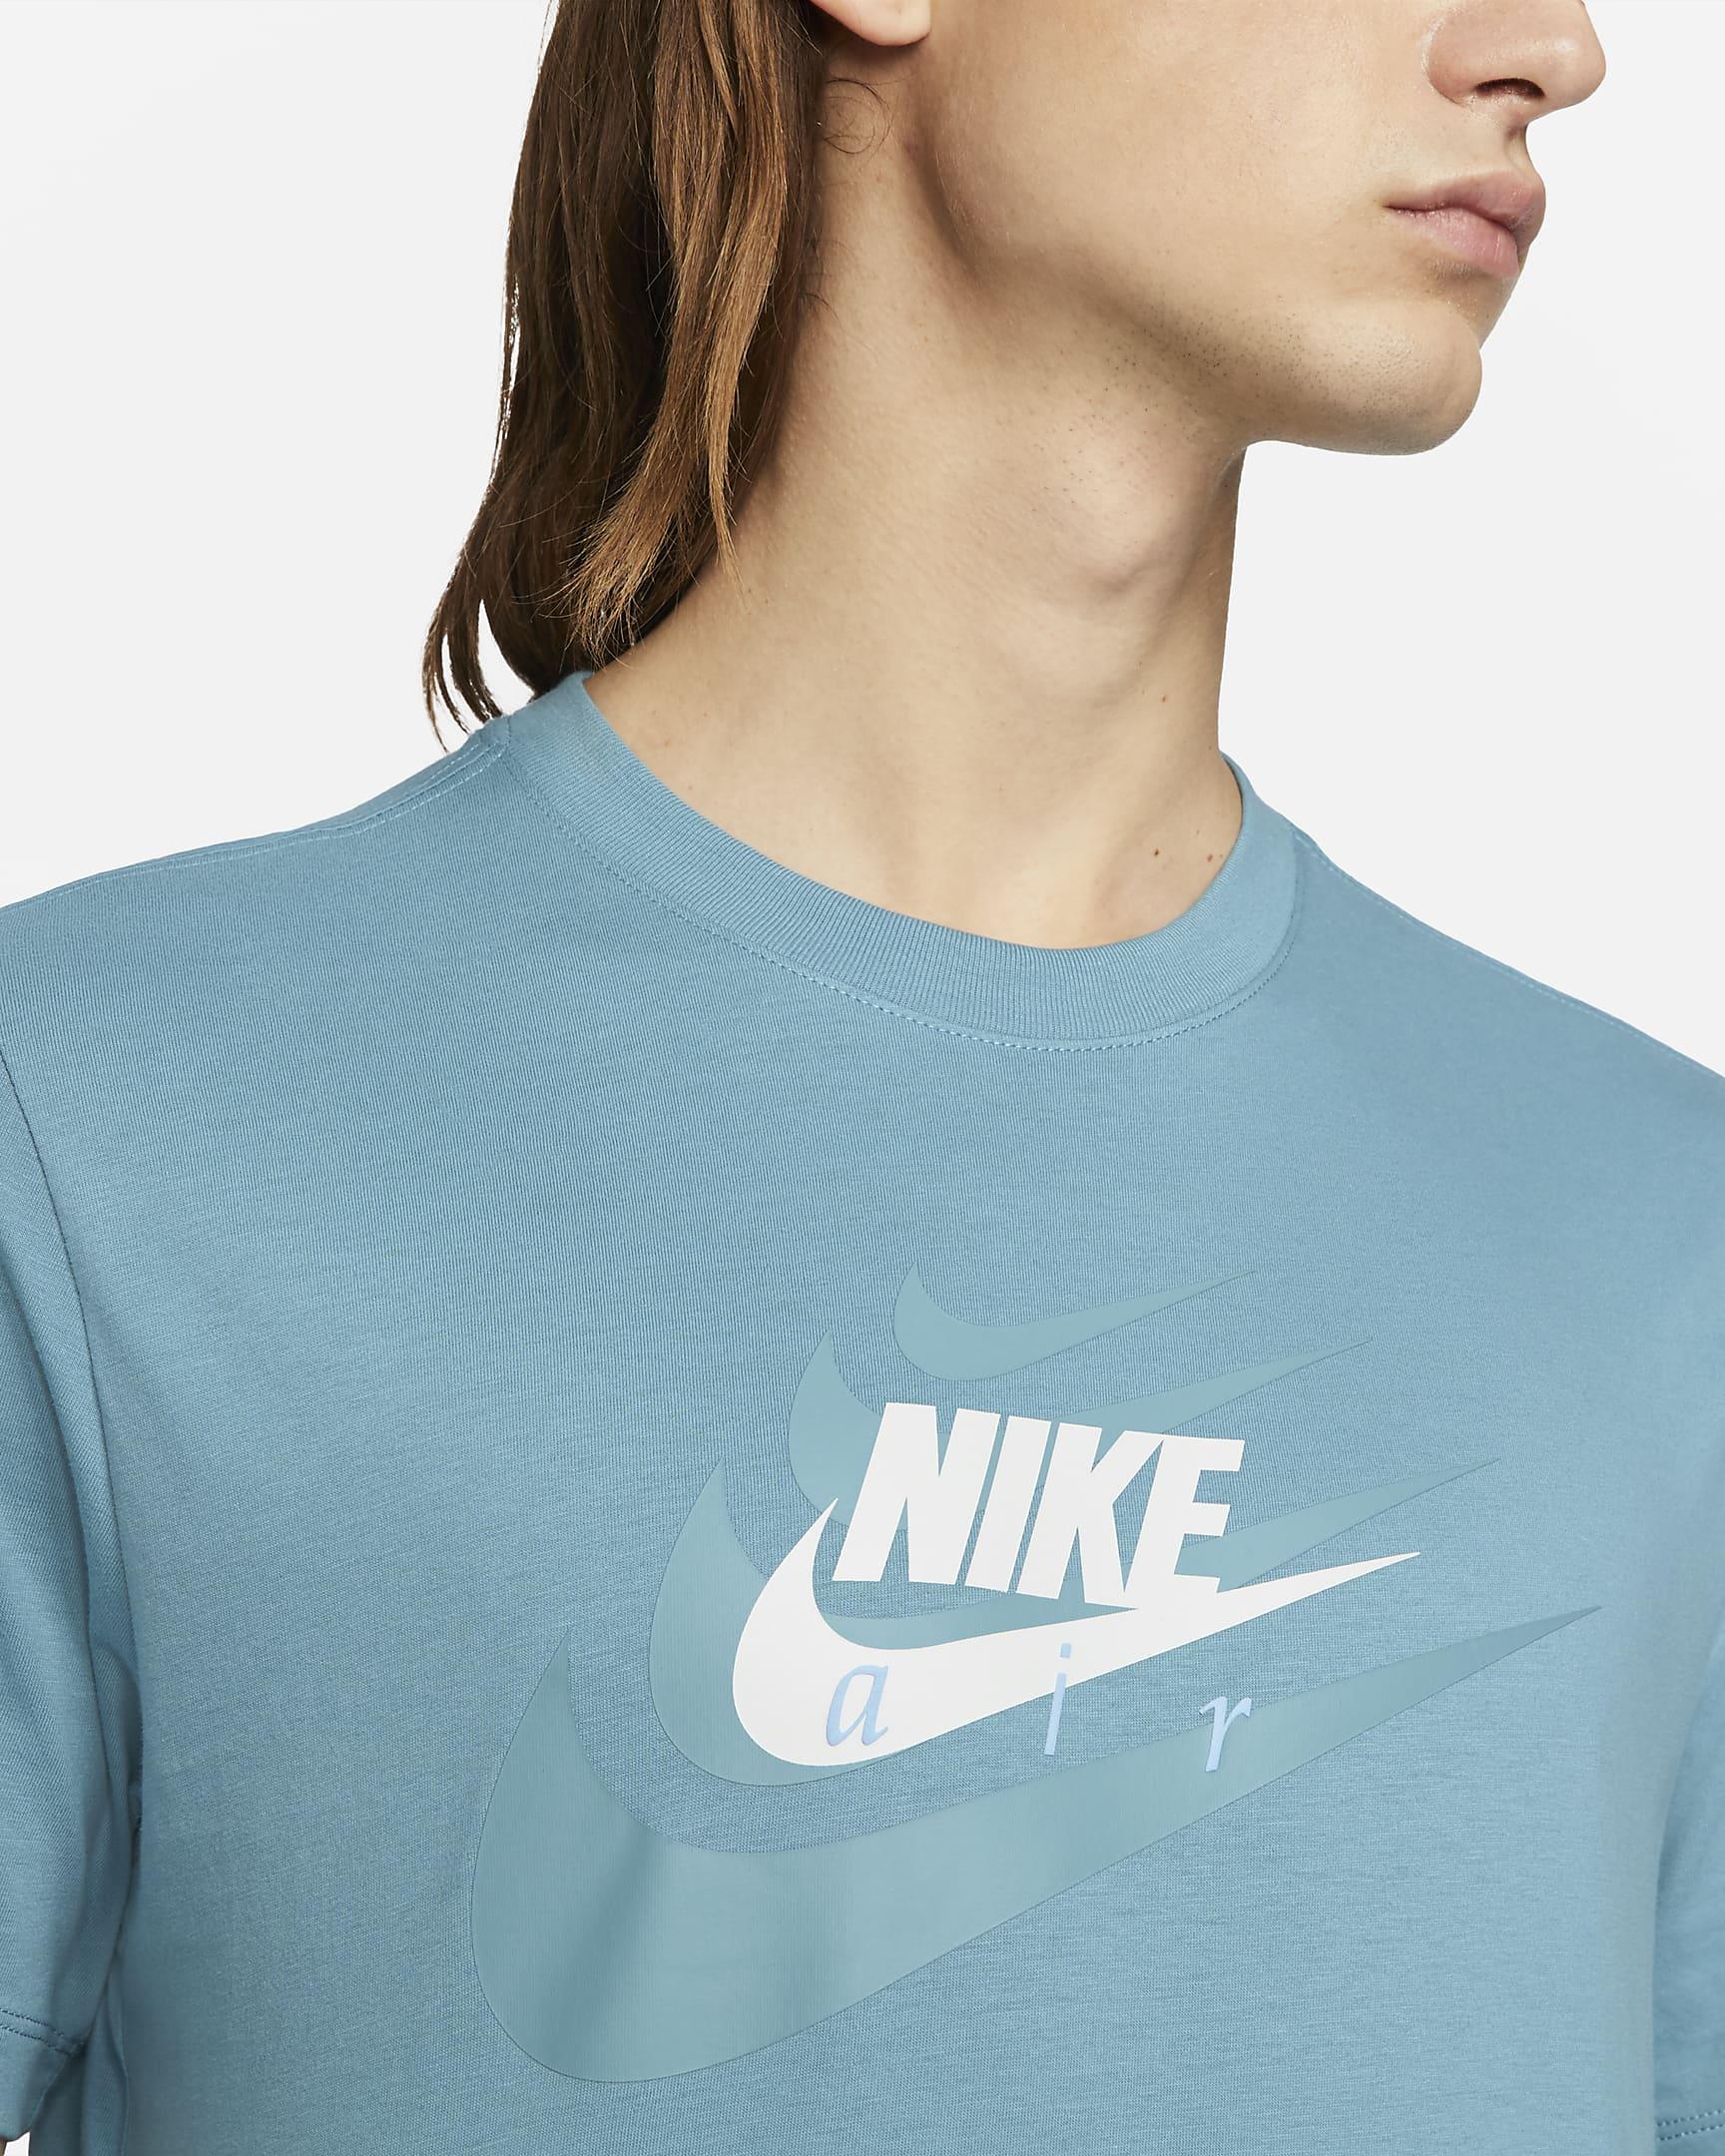 nike-sportswear-mens-t-shirt-sR6zxW-1.png